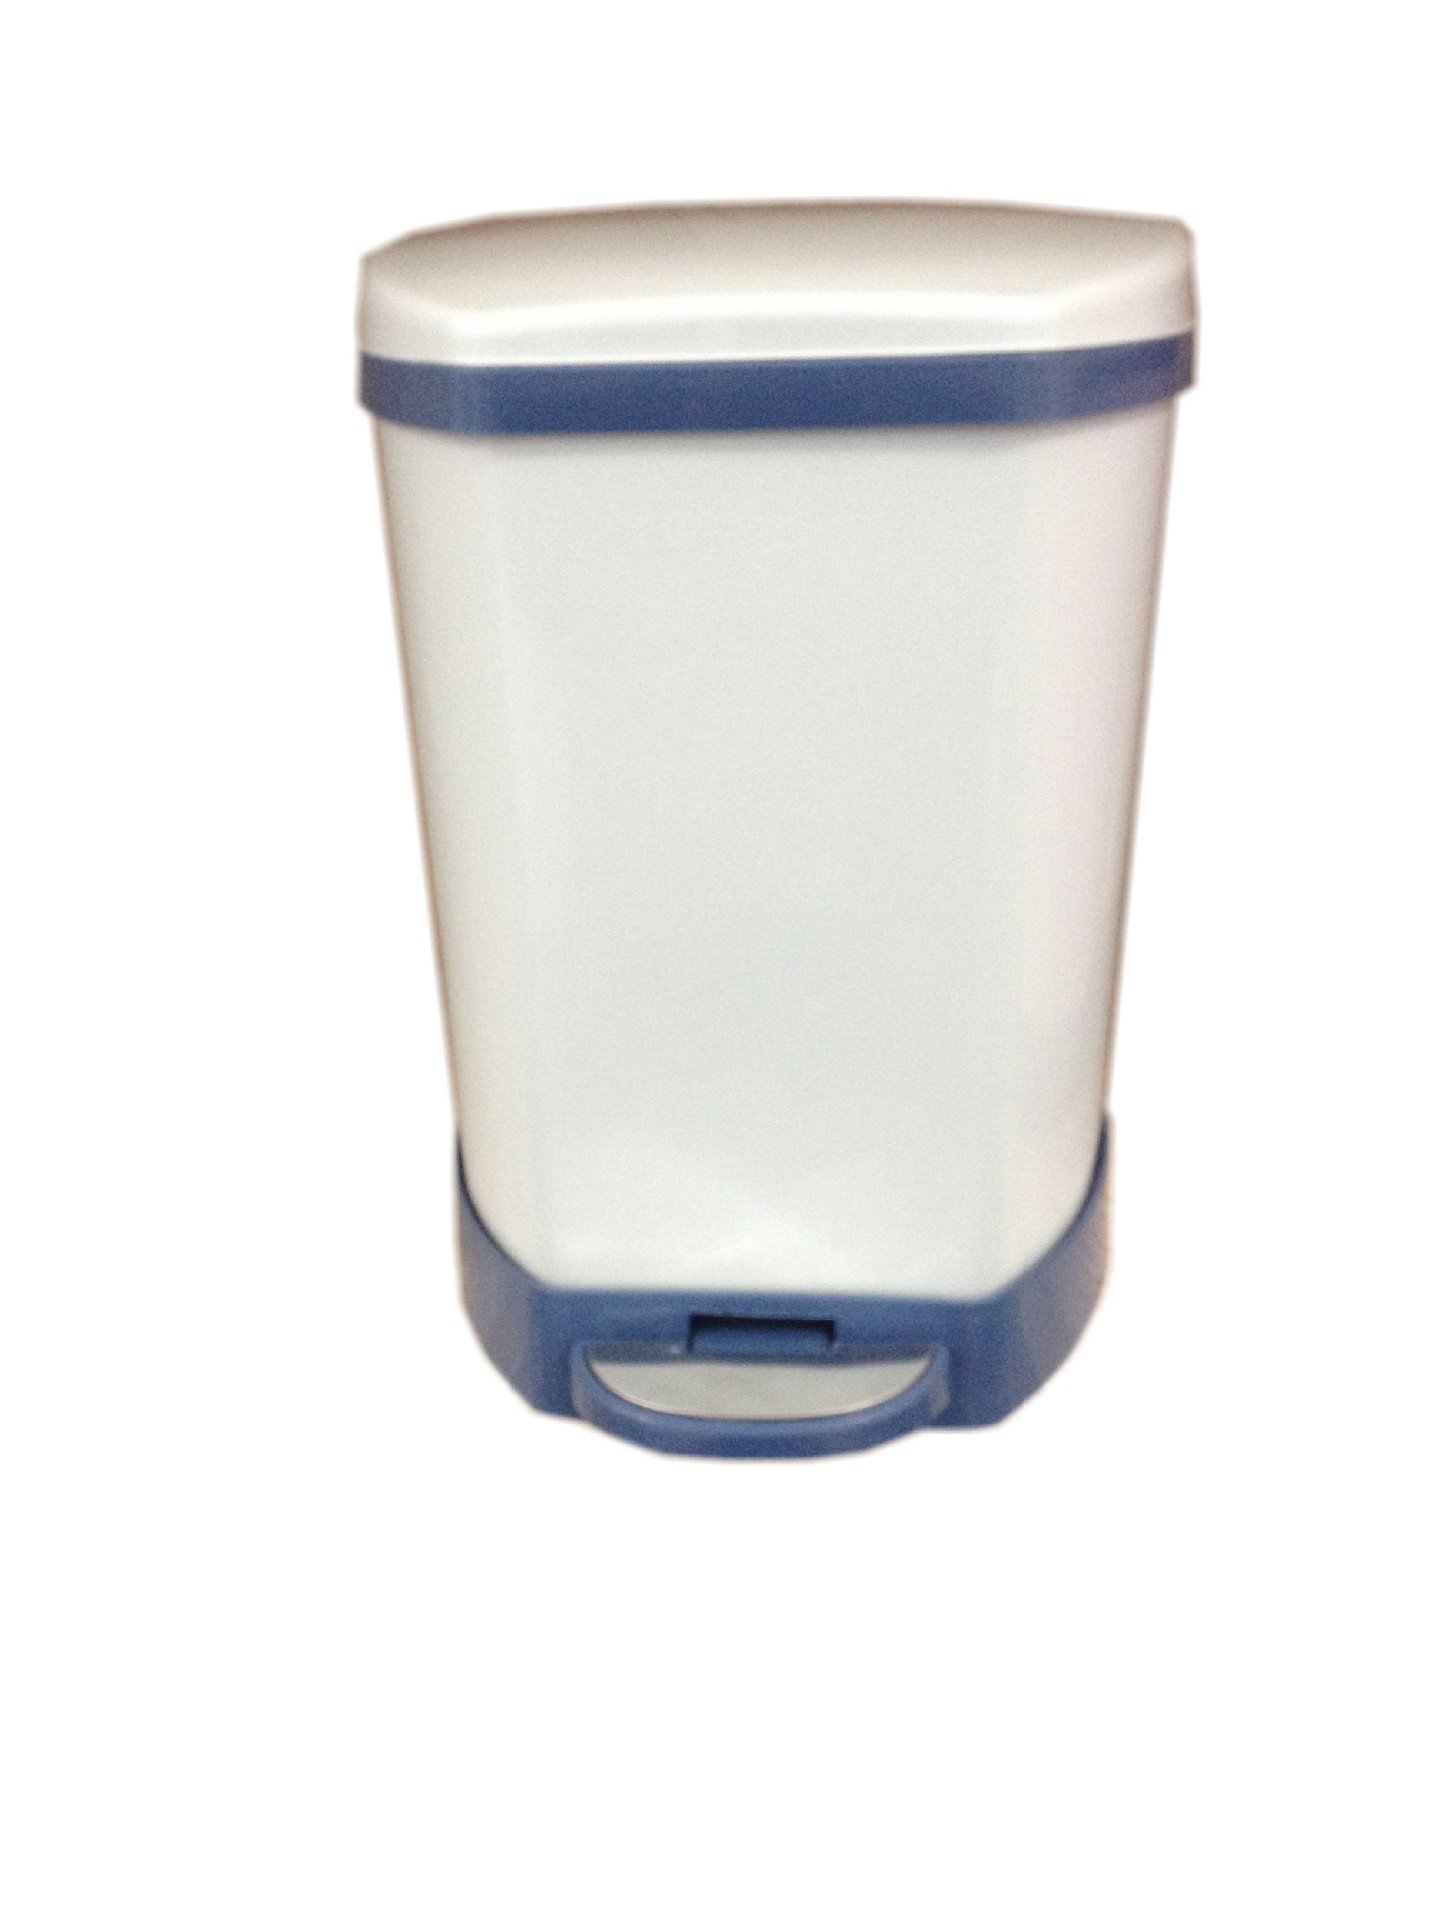 Dustbins Xiuxiutian Plastic fold foot health barrels 282428cm, Style 1